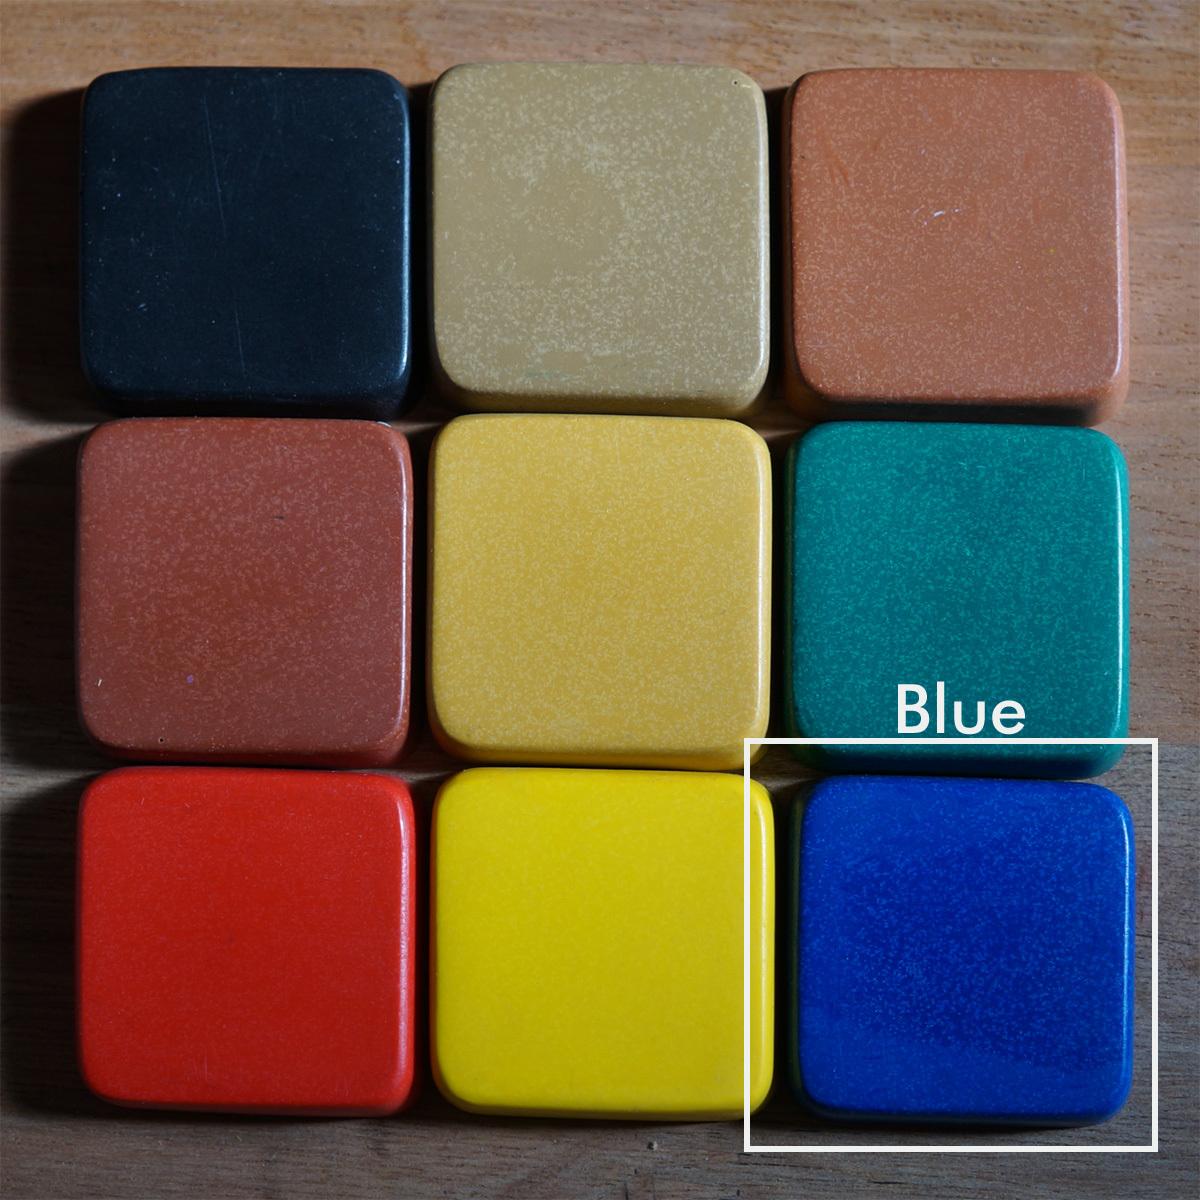 PIGMENT BLUE 200g(着色剤:青 200g) - 画像2